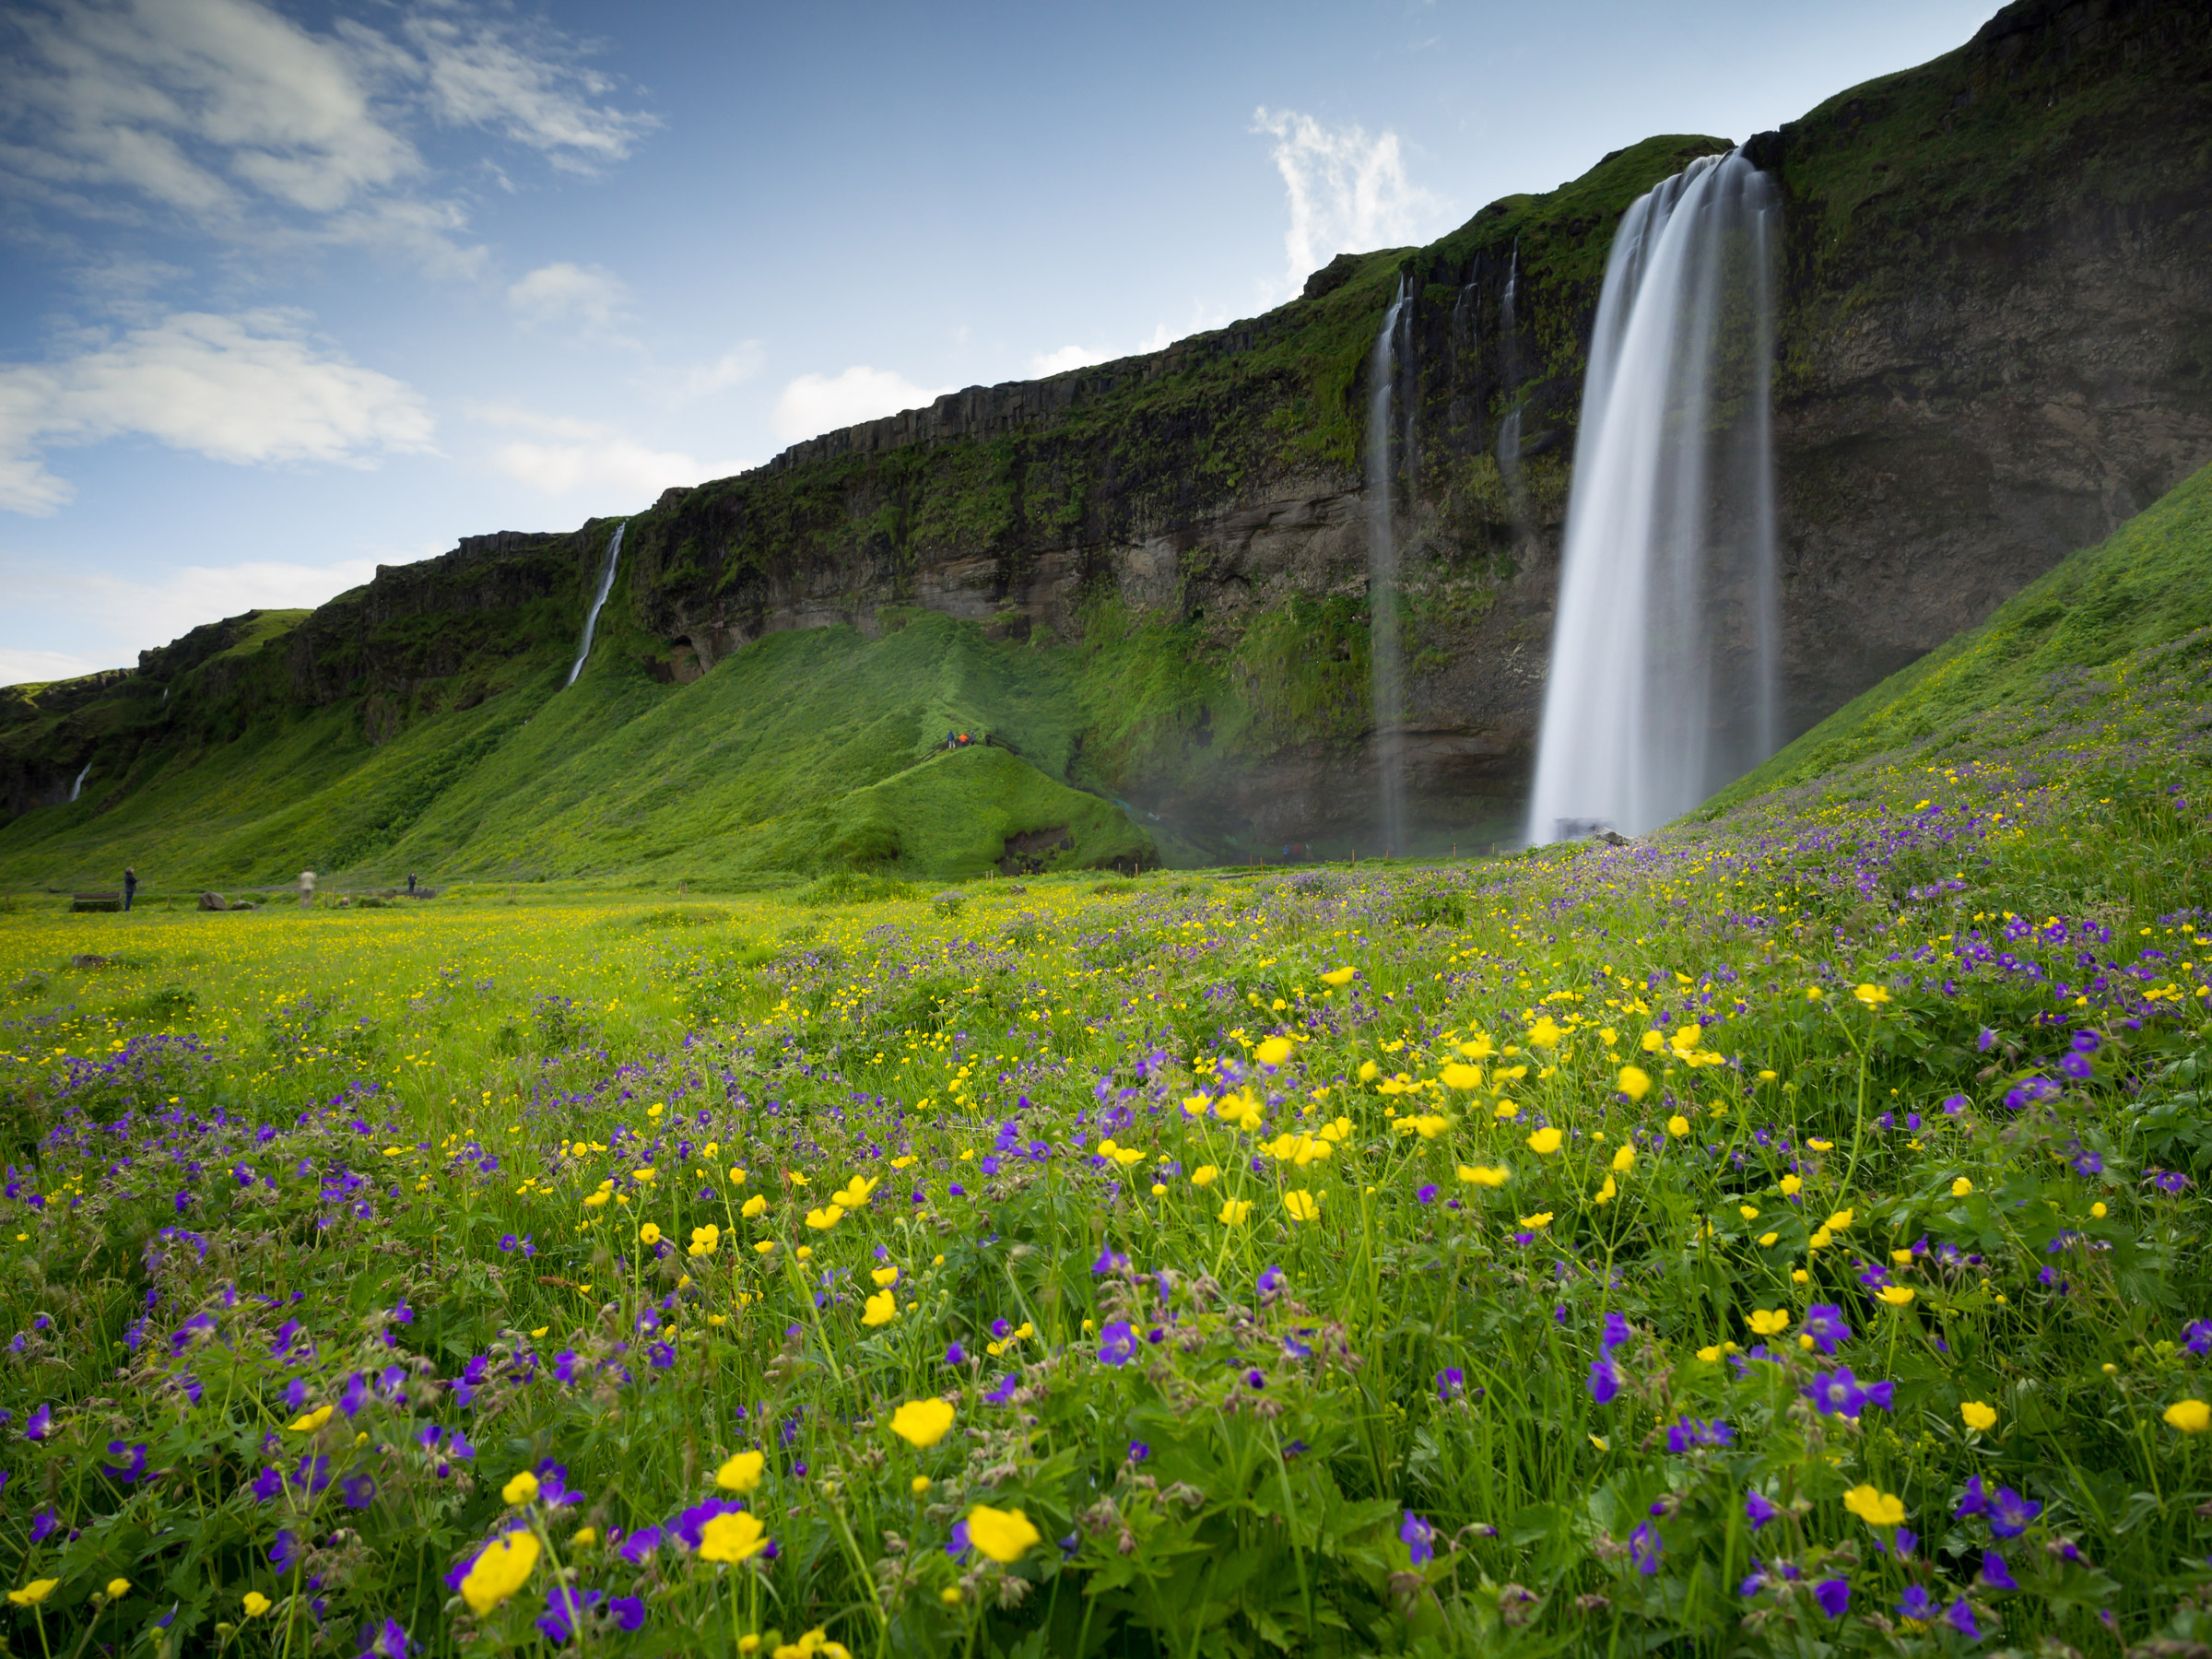 Icelandic waterfalls and flowers